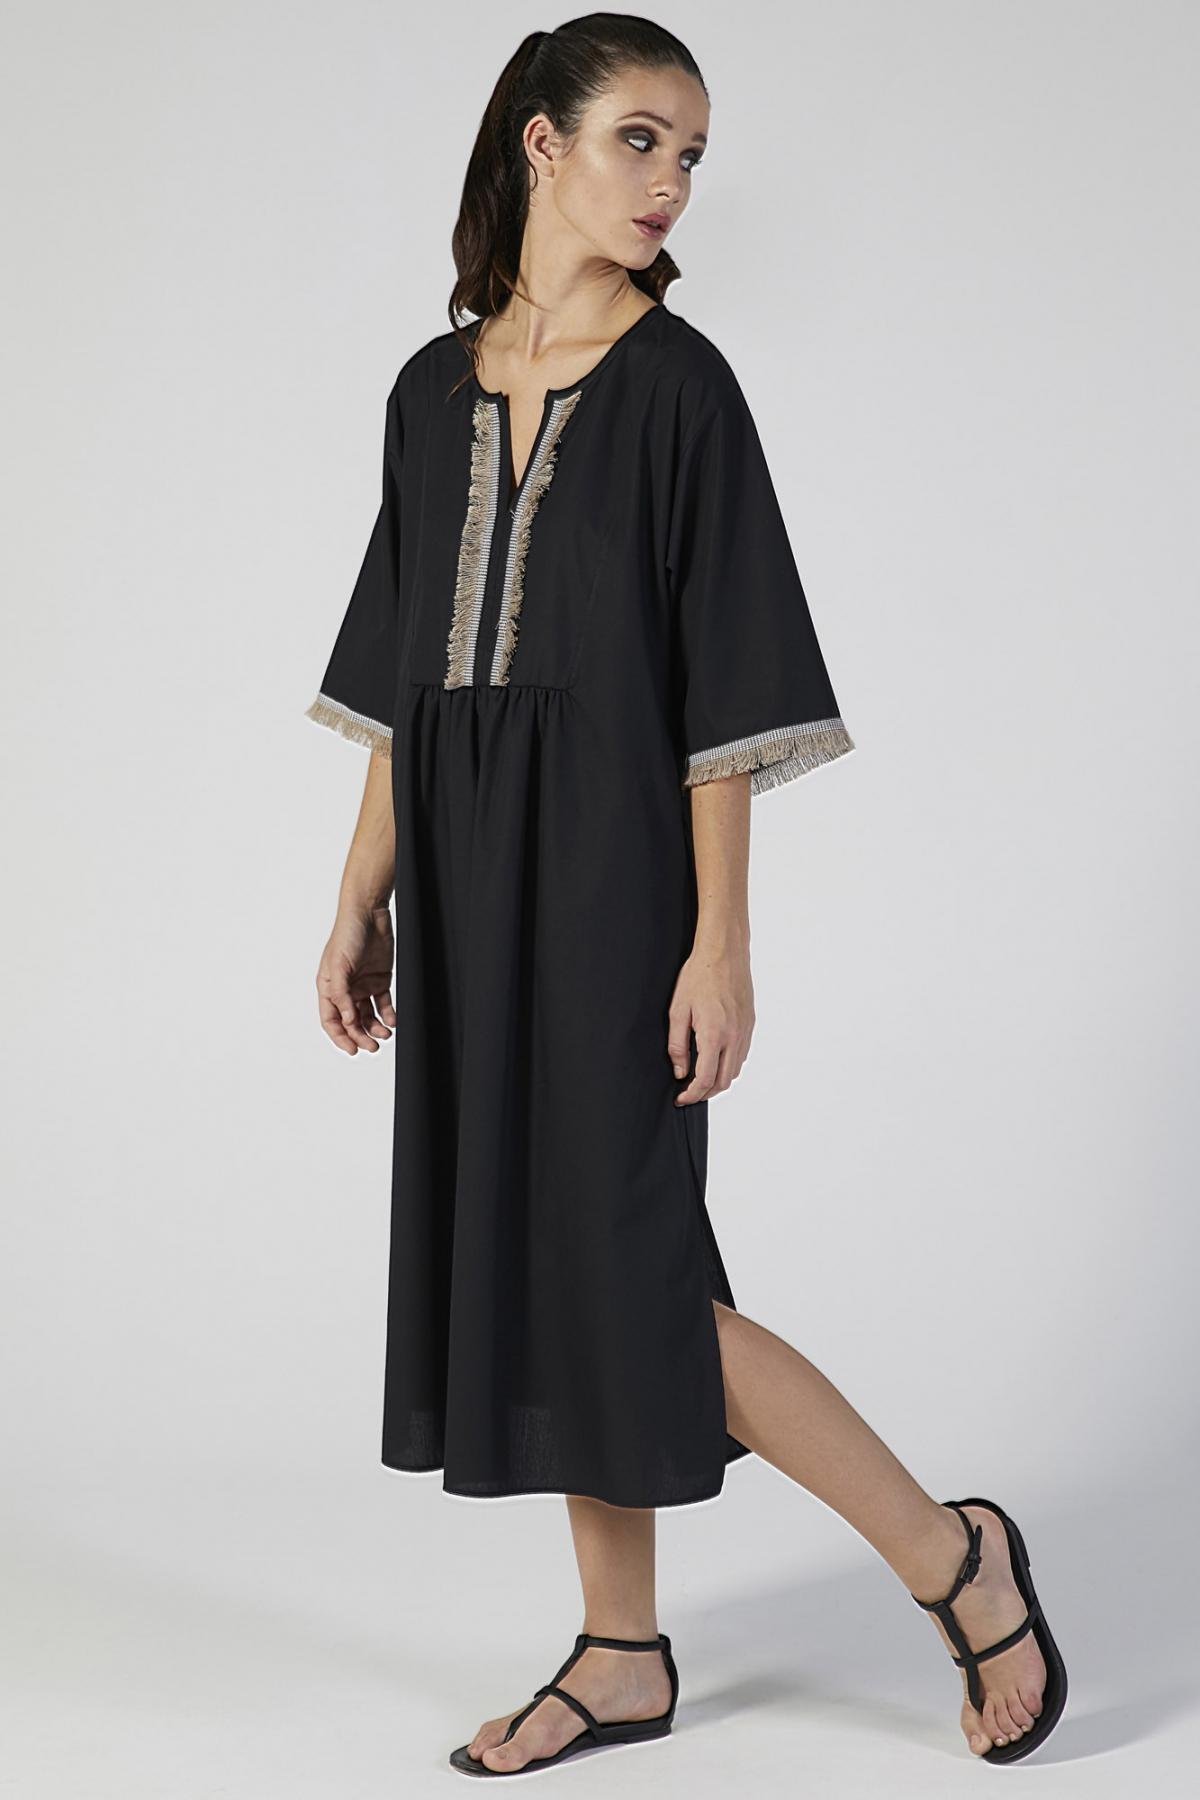 kaftano copricostume manica corta verdiani donna loungewear